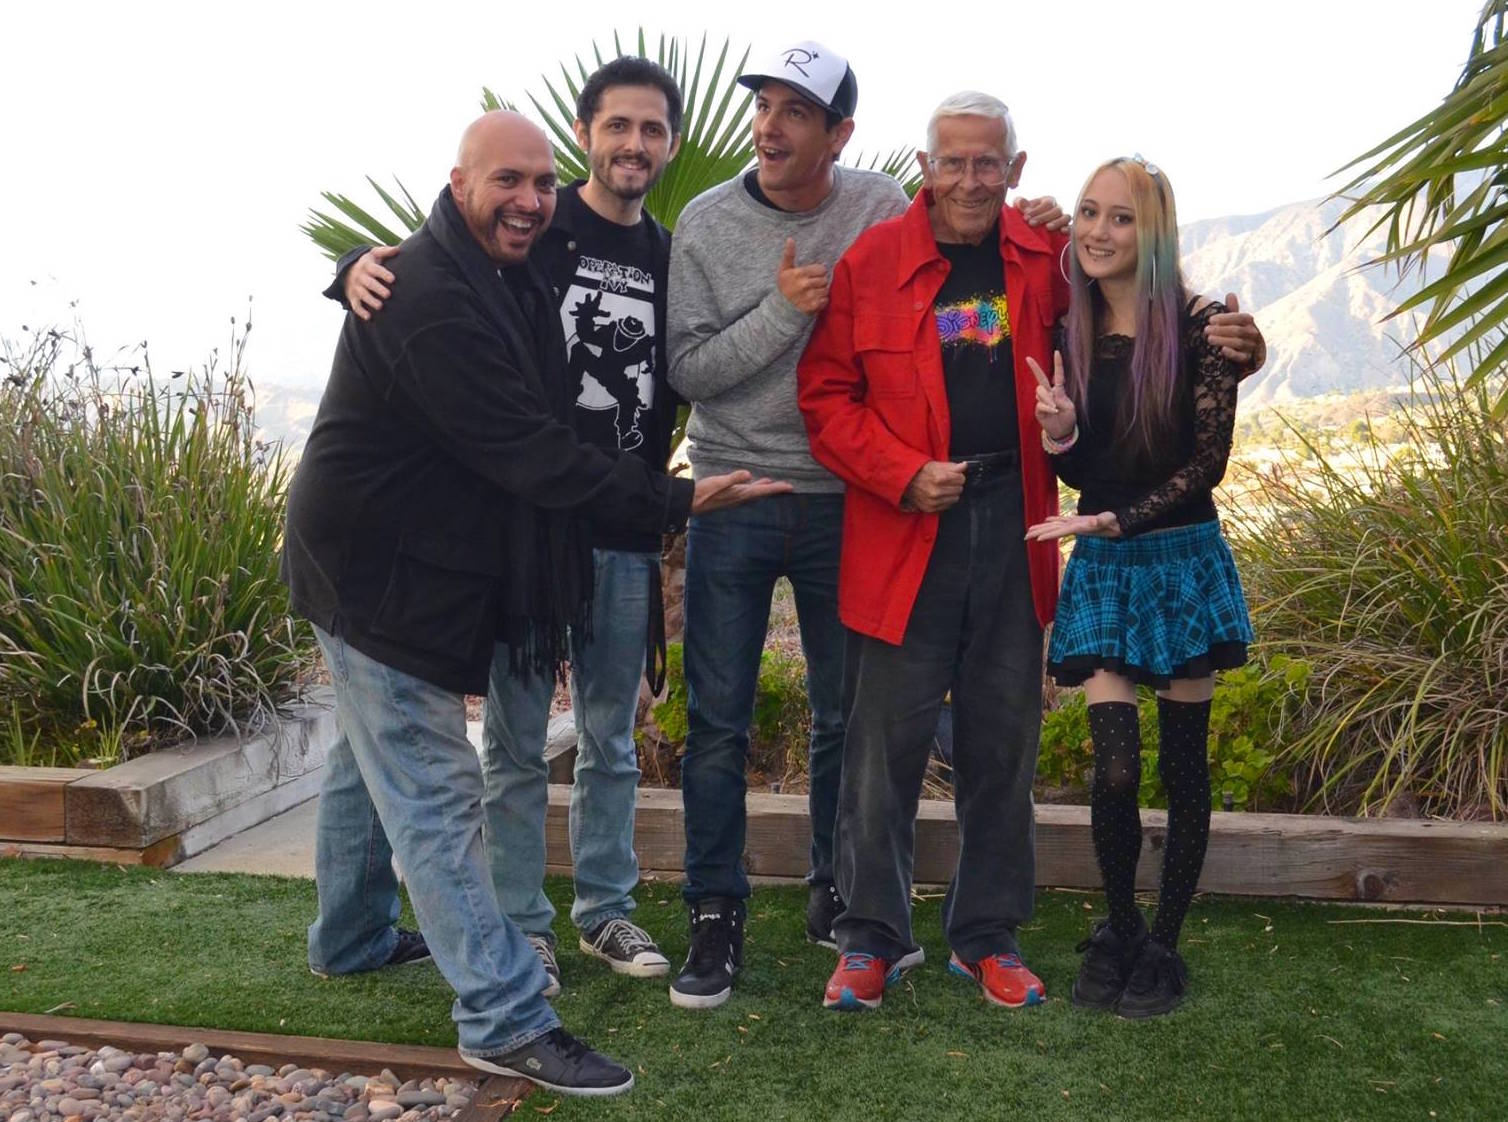 Group photo, taken in Bob's garden (From Left: Ernie Alonzo, Frank Argueta,Justin Scarred, Bob Gurr, Genevieve Federhen).